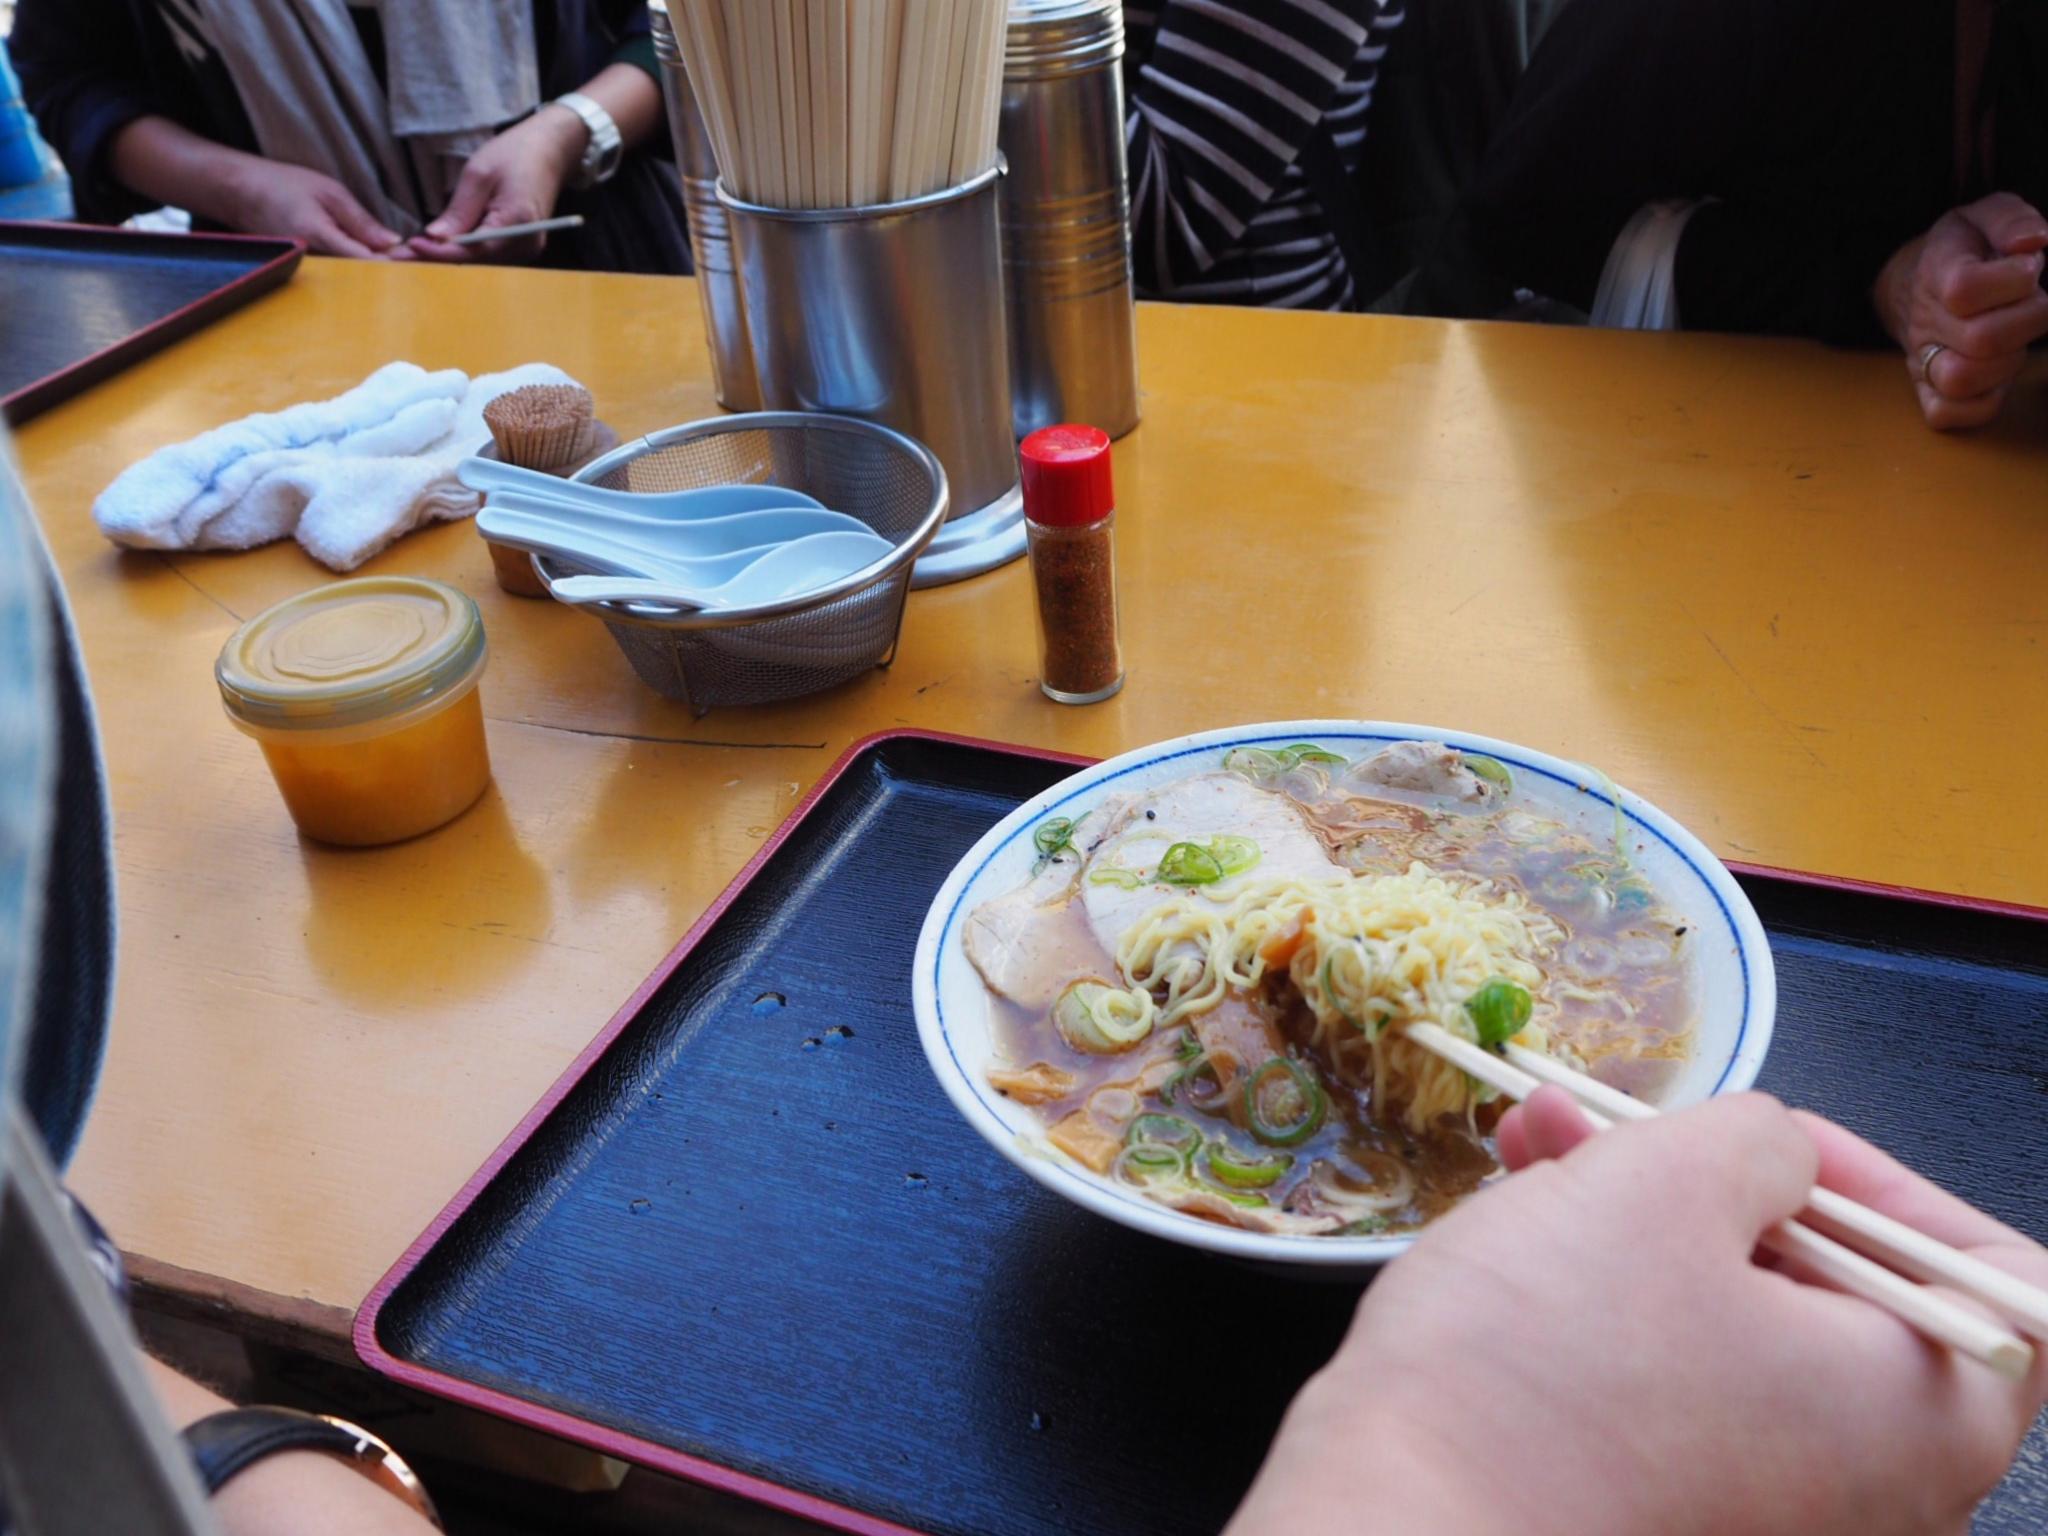 Sister's breakfast ramen on the crowded sidewalk in front of Tsukiji Fish Market